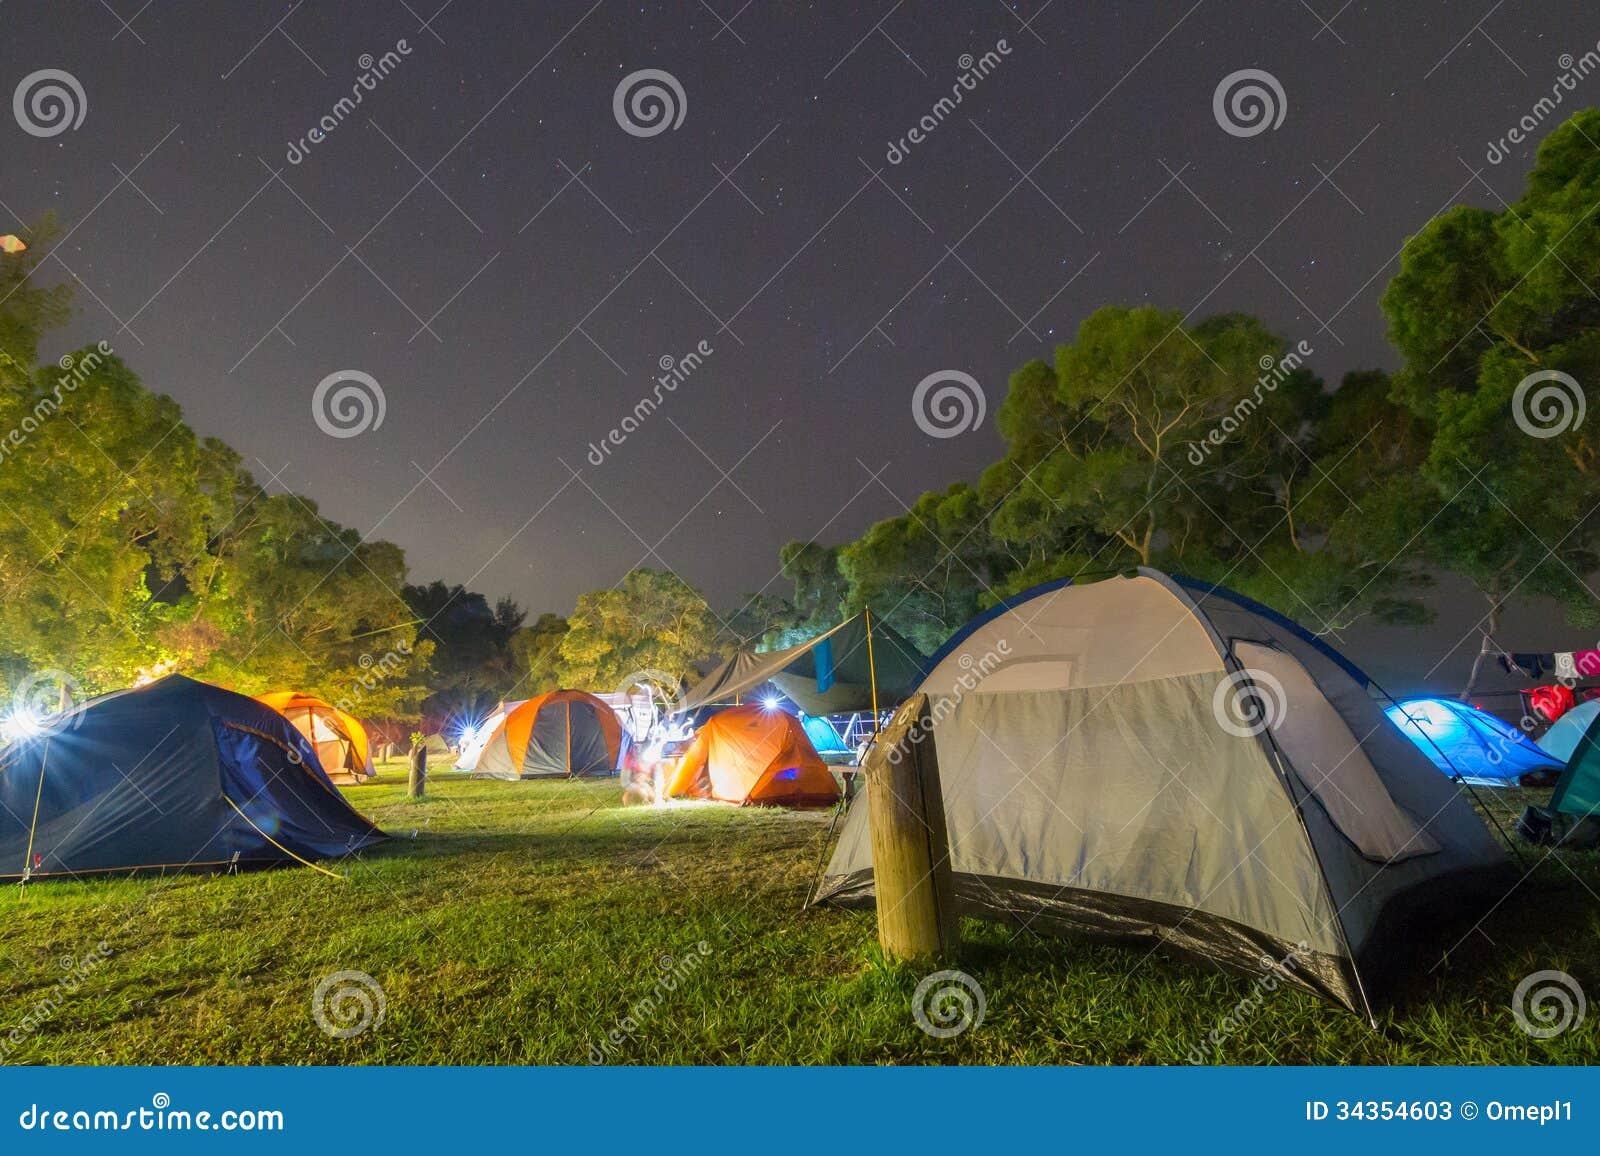 Kampeerterrein bij Nacht